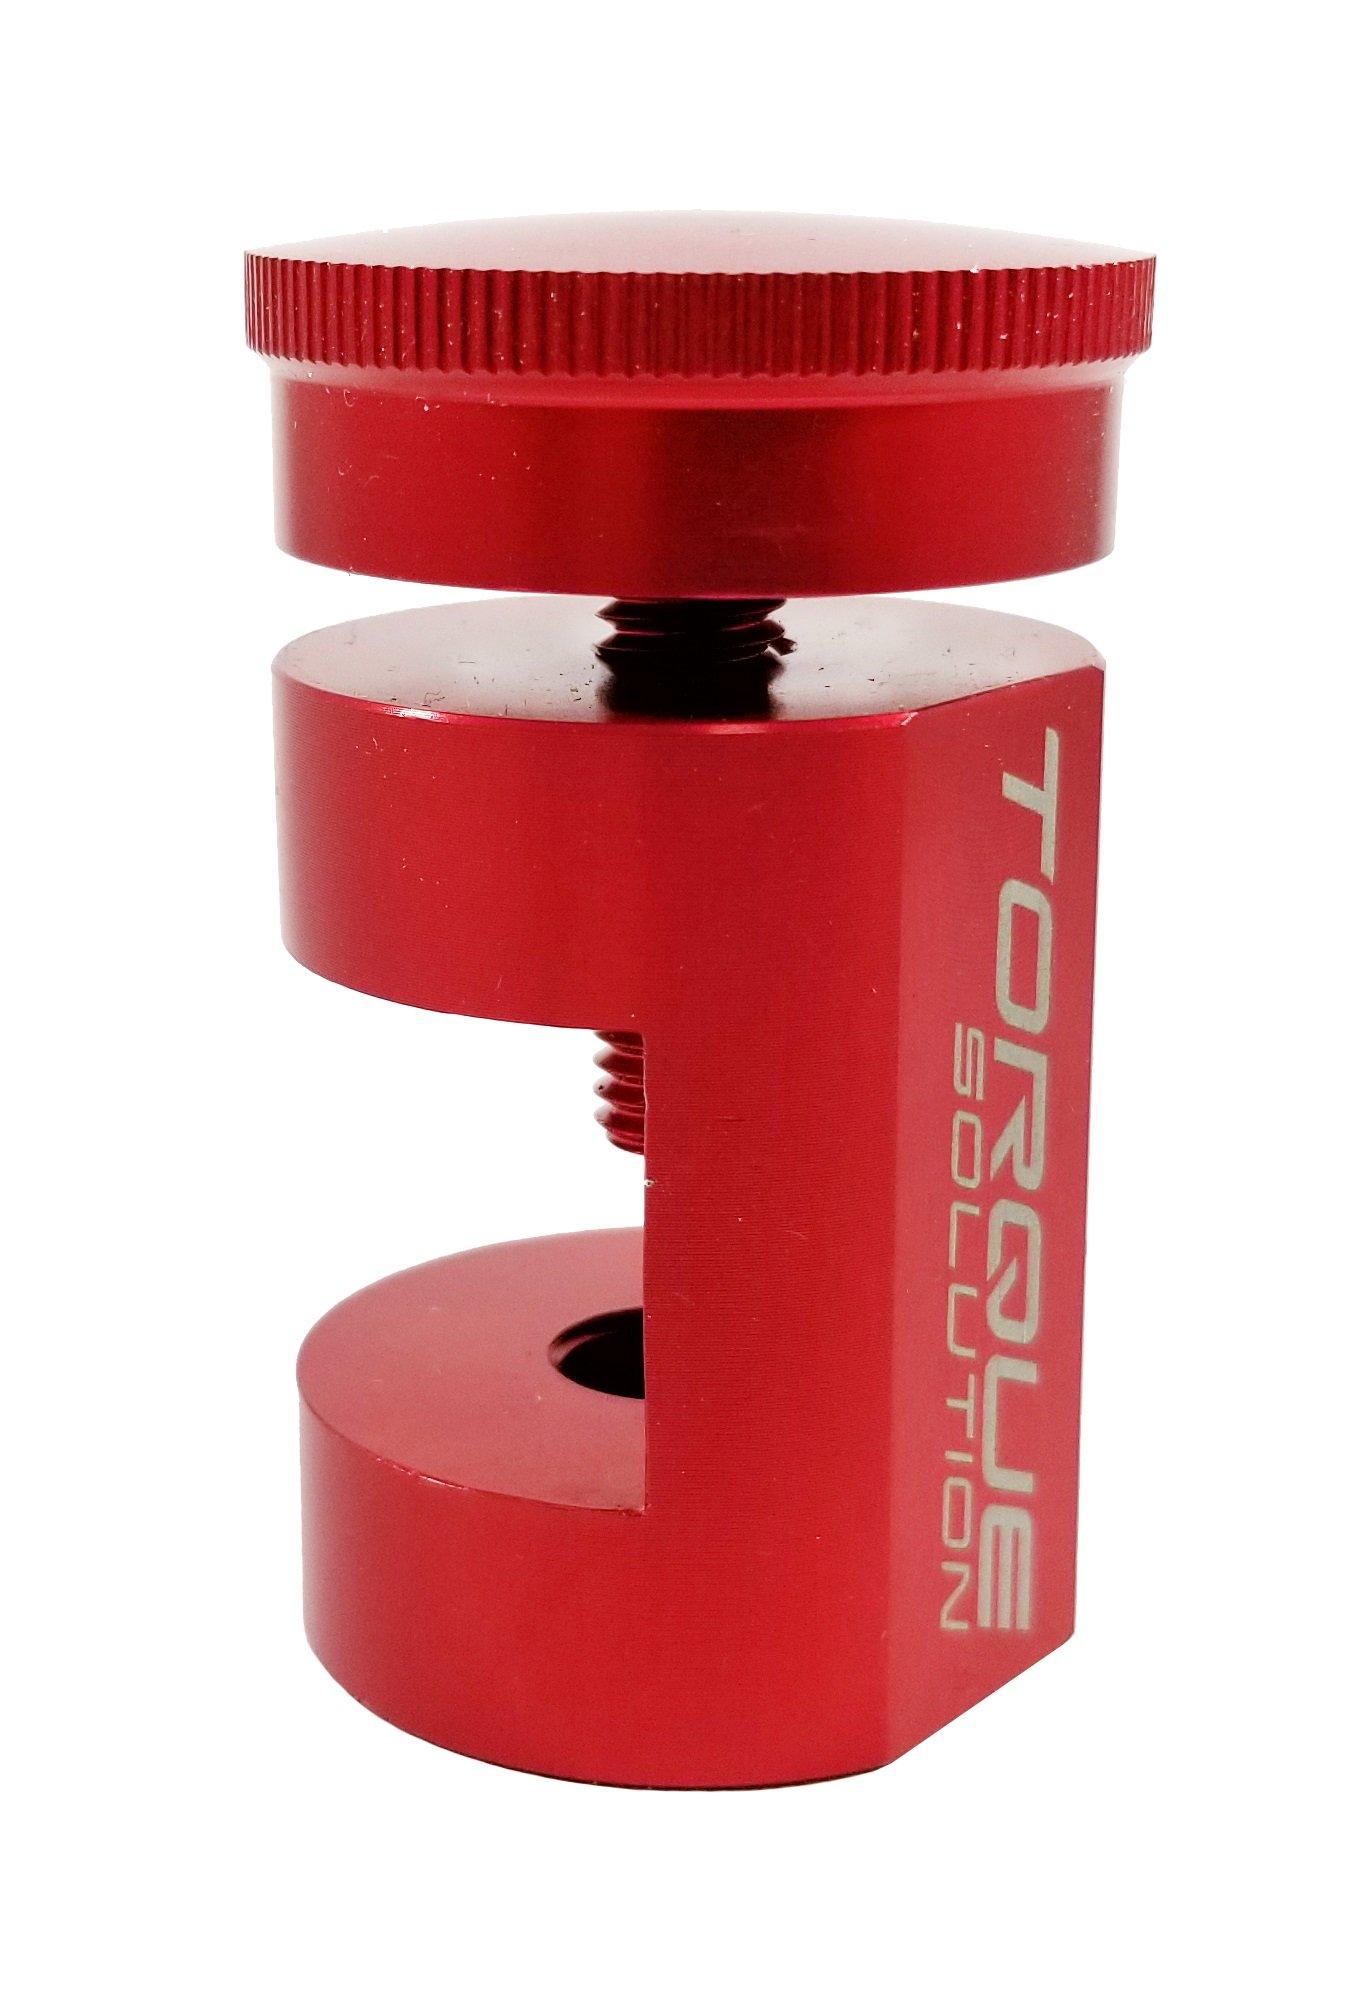 Torque Solution Precision Spark Plug Gap Tool for 12mm Threaded Spark Plugs